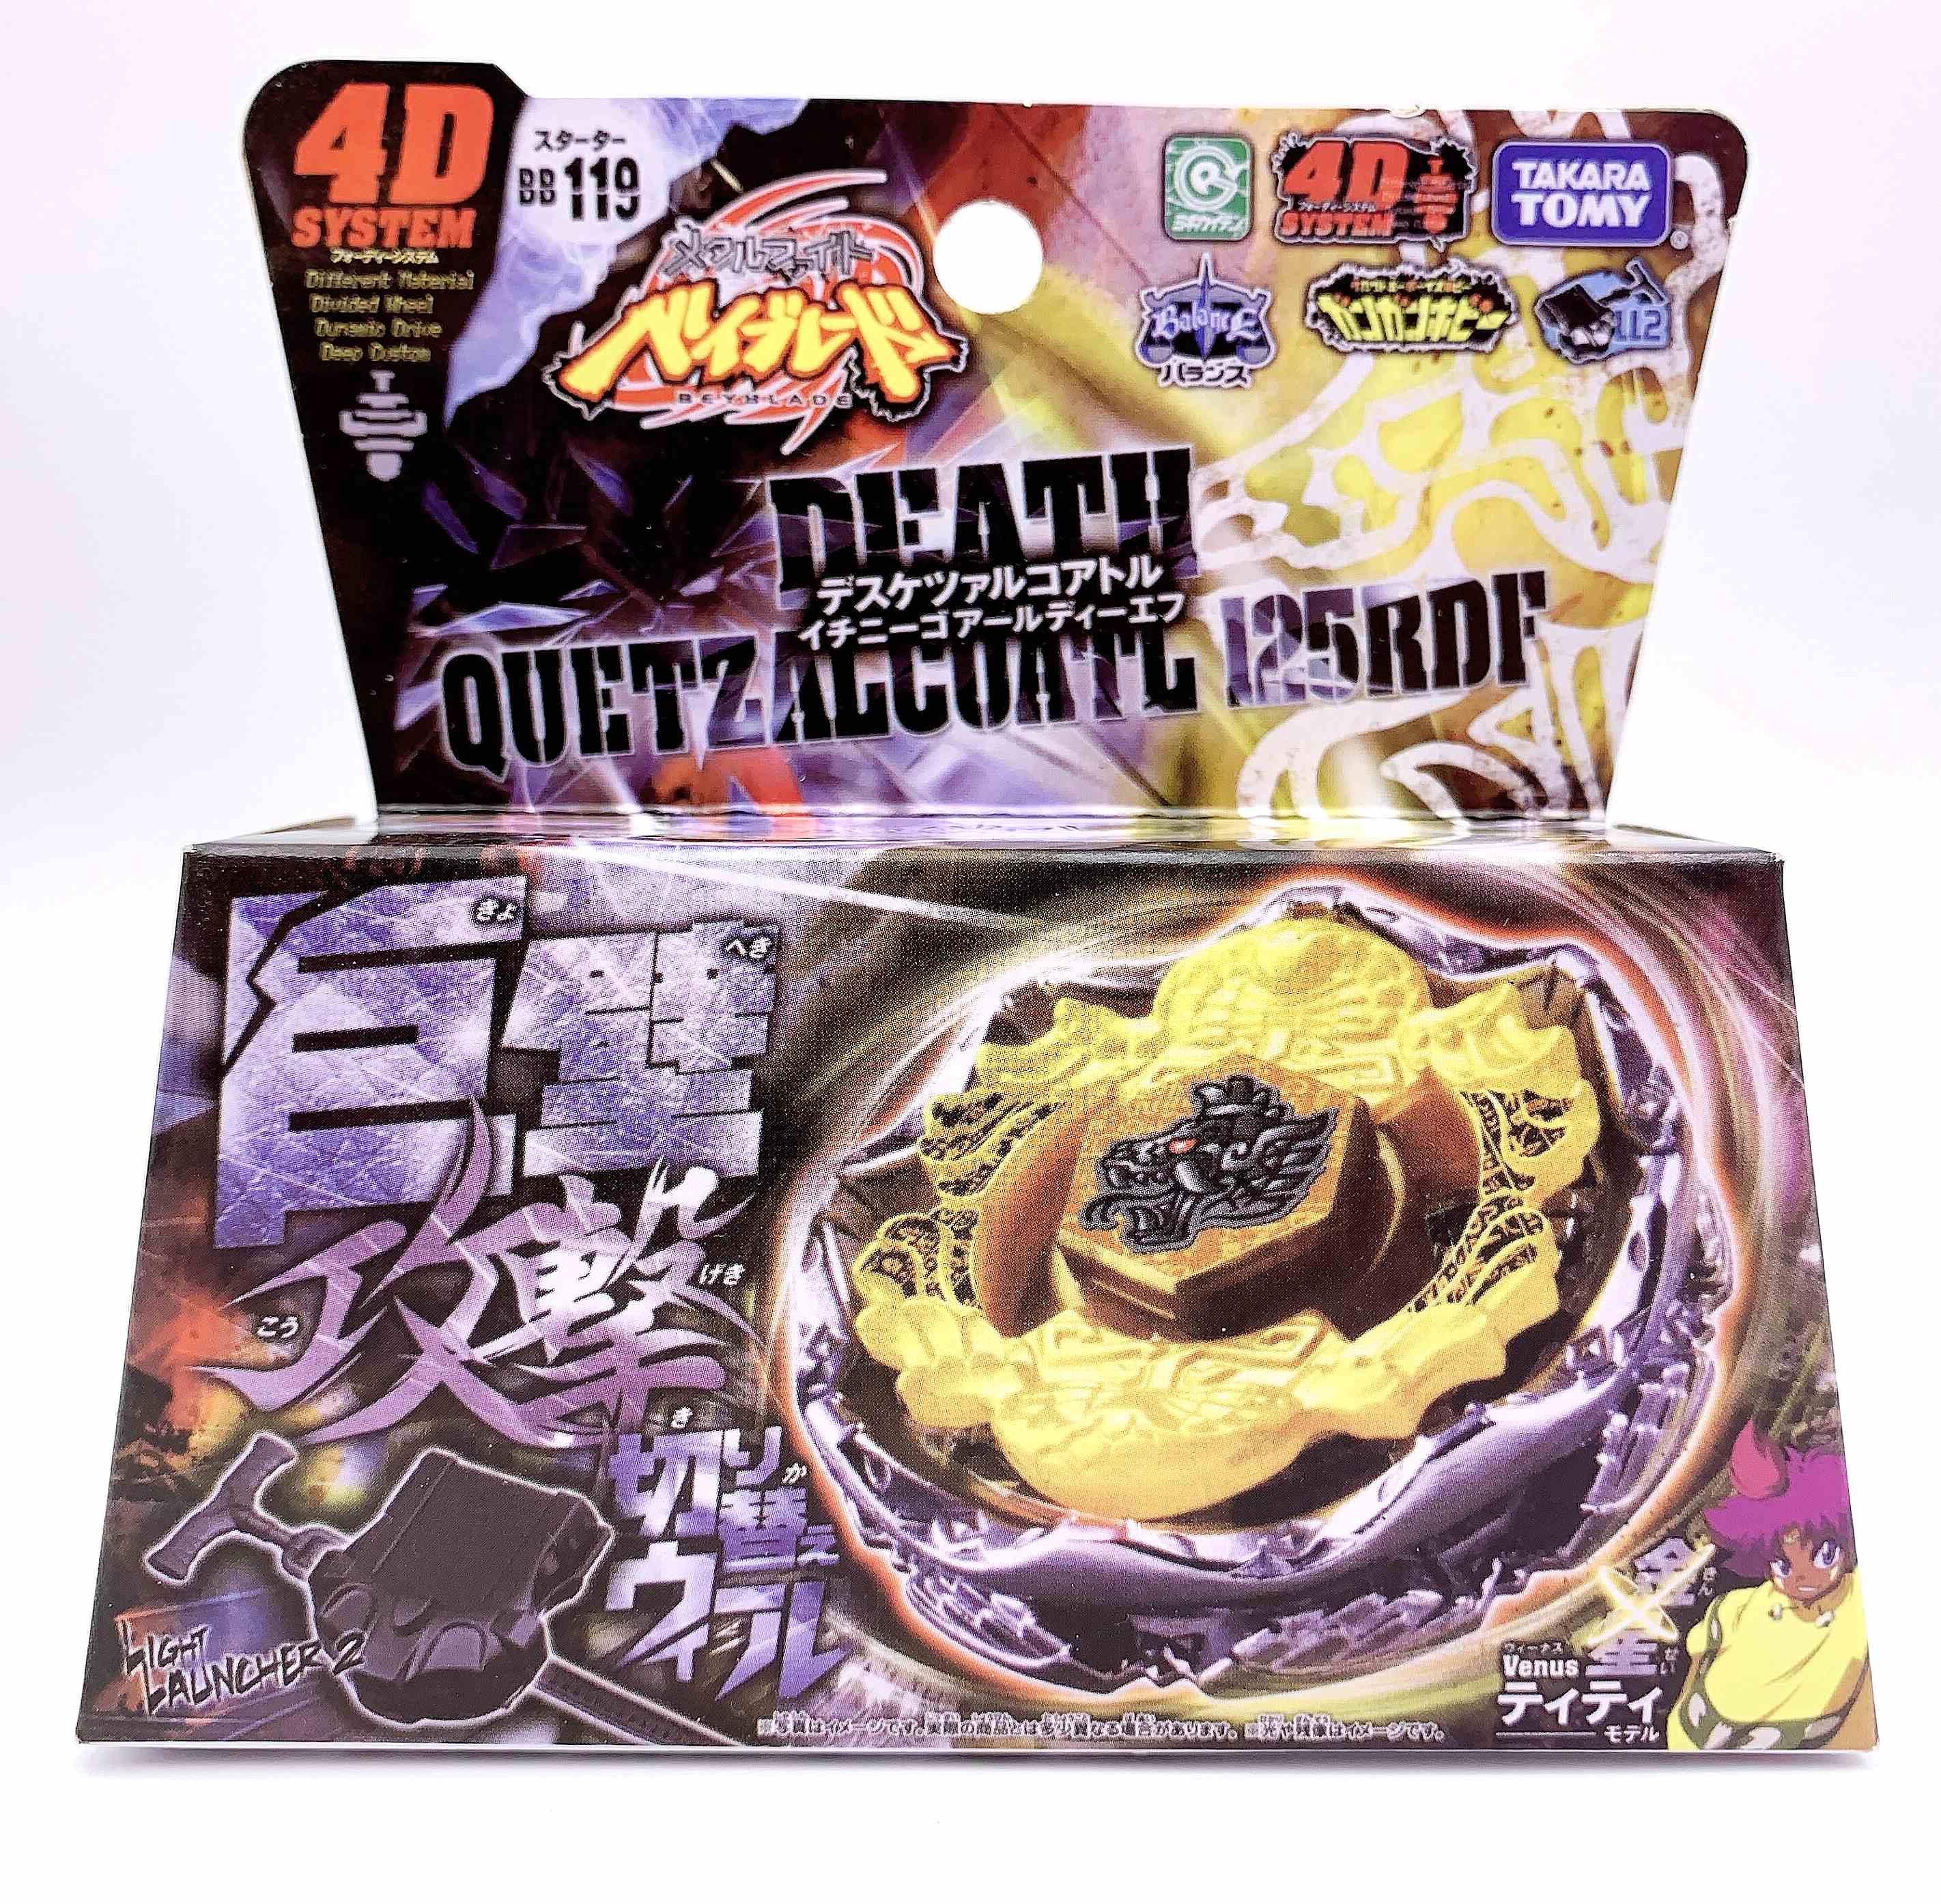 Takara tomy beyblade BB119 Death Quetzalcoatl 125RDF LAUNCHER